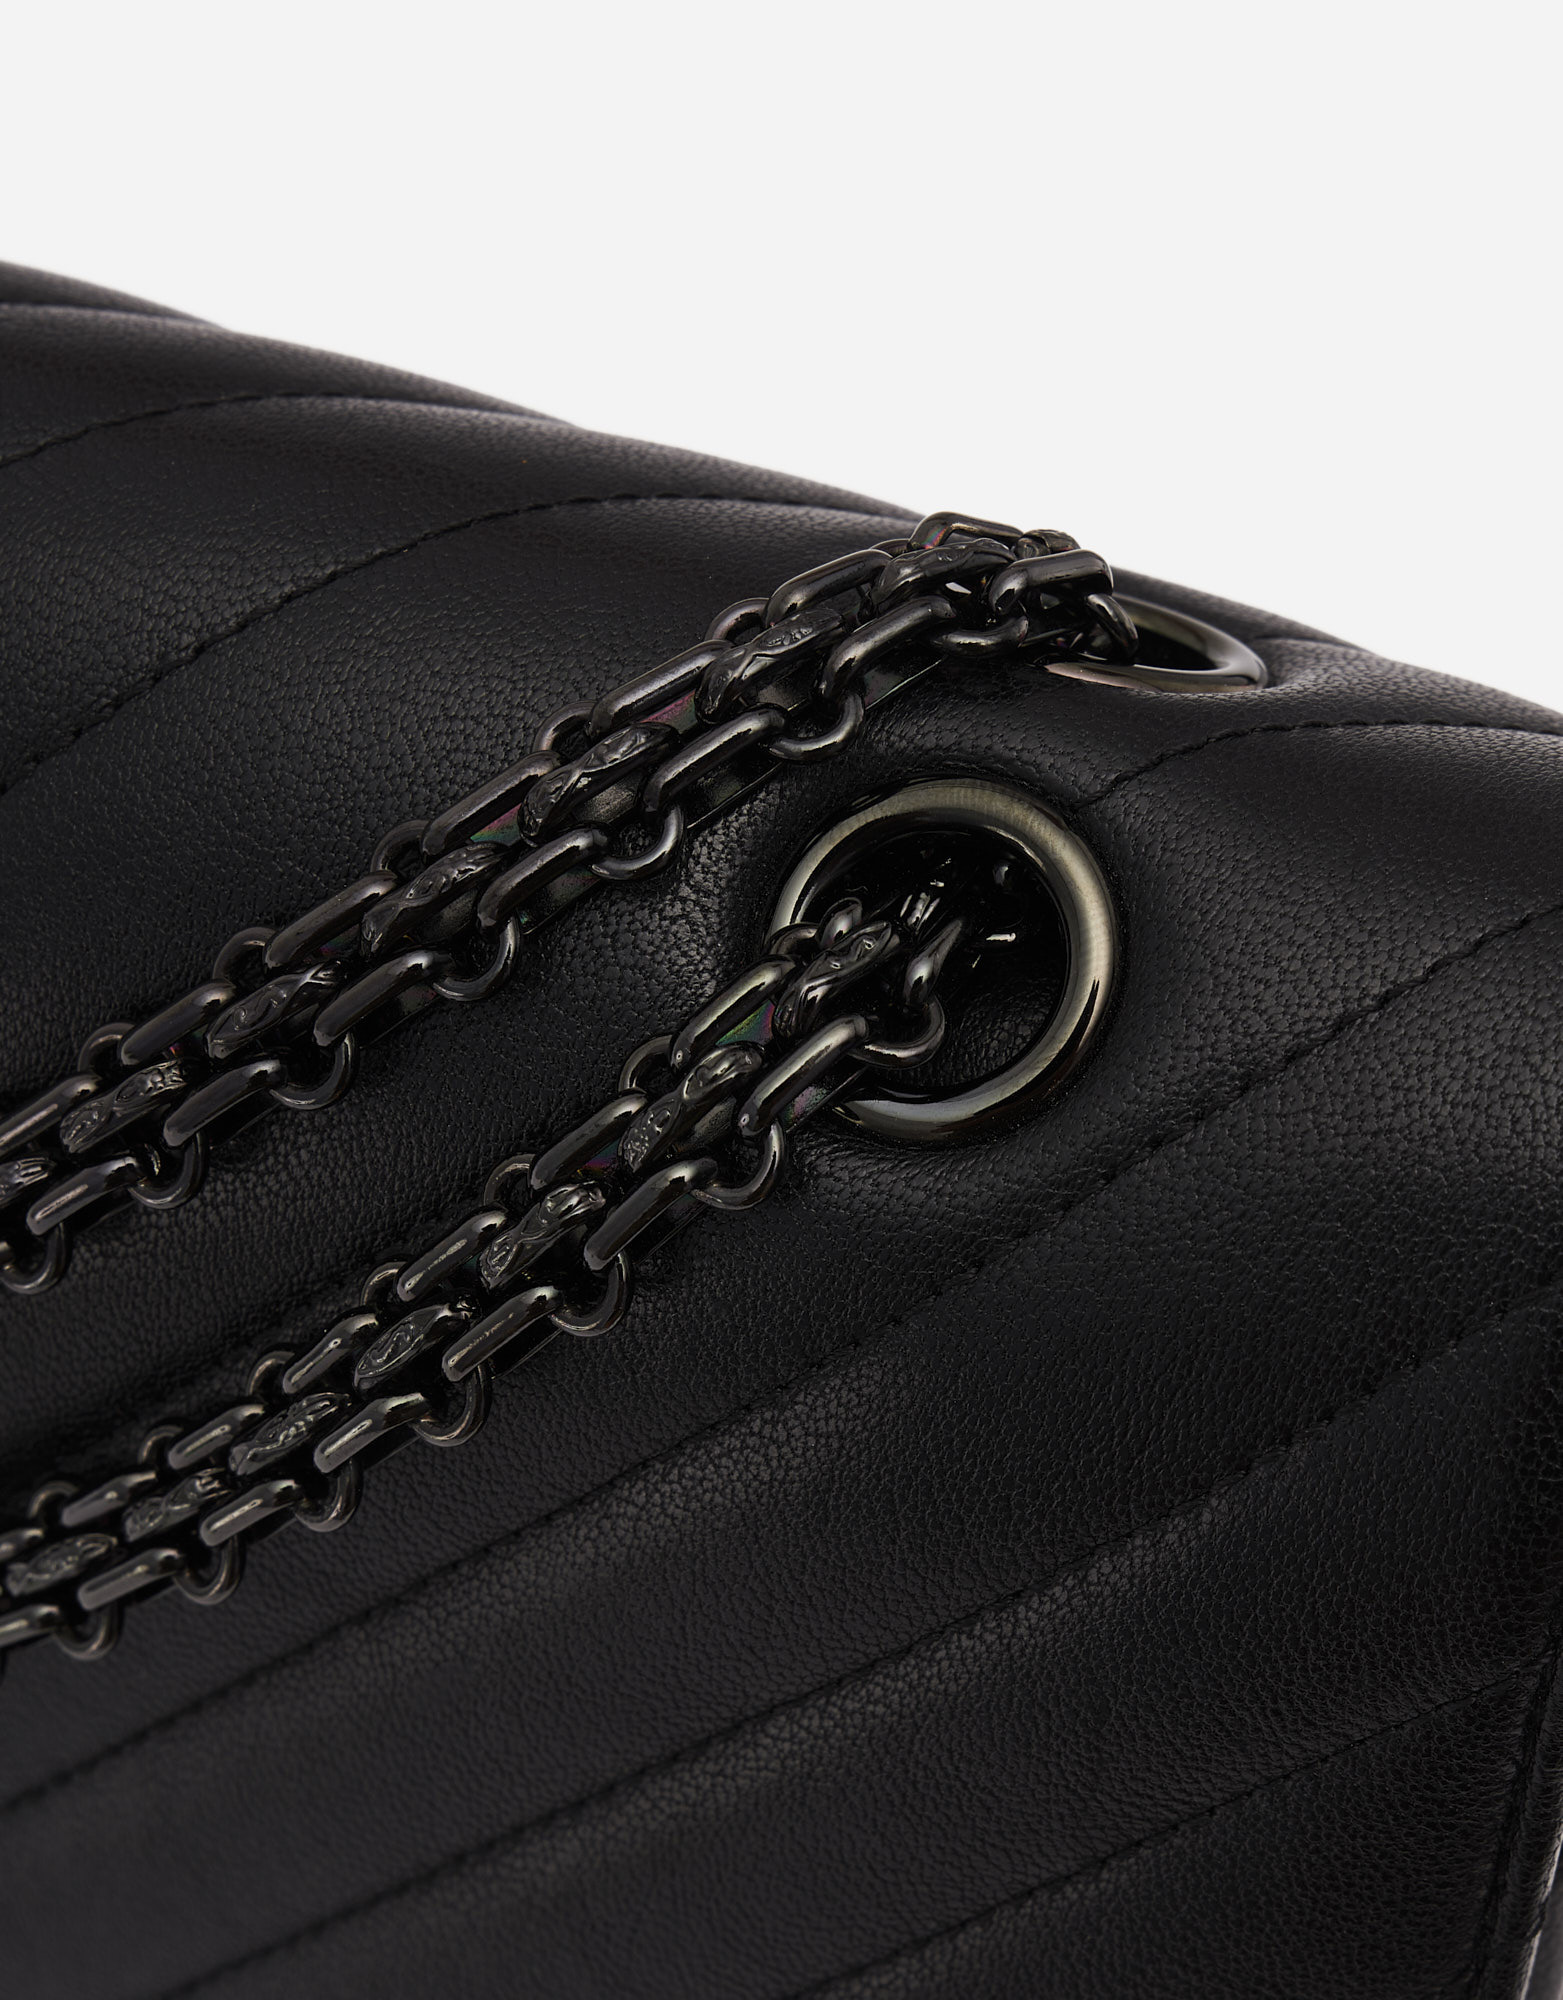 Chanel 2.55 Reissue 227 Lamb So Black Edition Metal Chain Strap